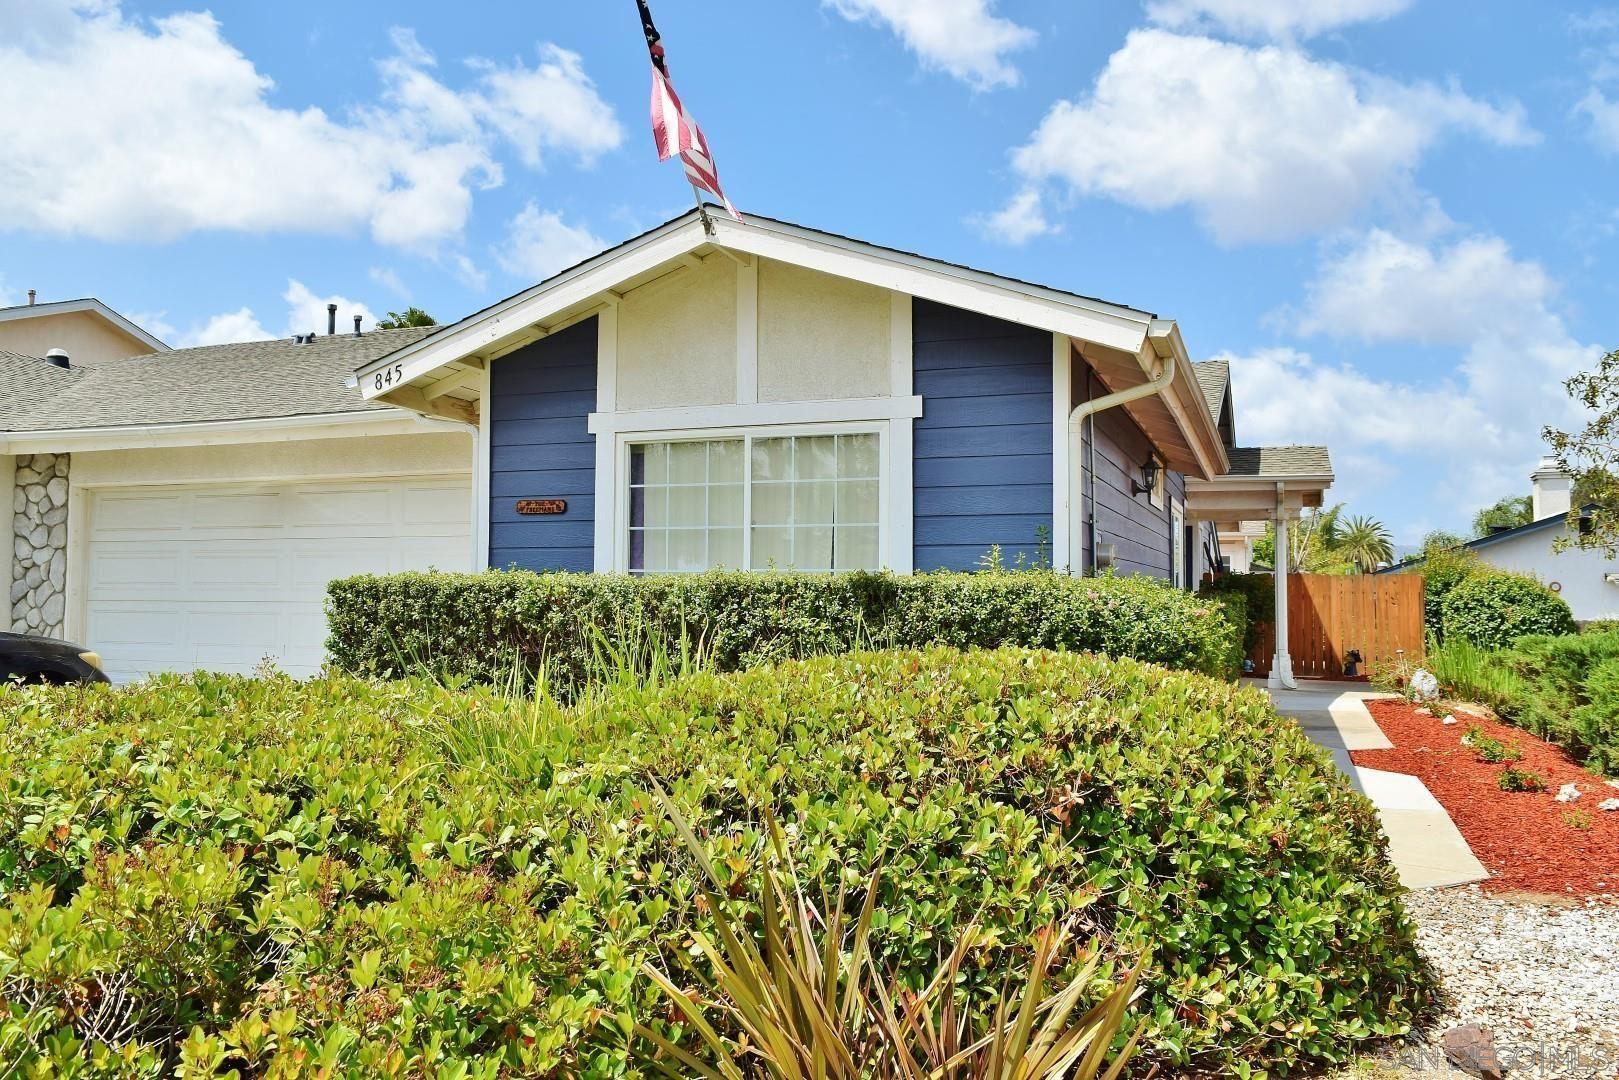 Photo of 845 Oak Village, Ramona, CA 92065 (MLS # 210014813)